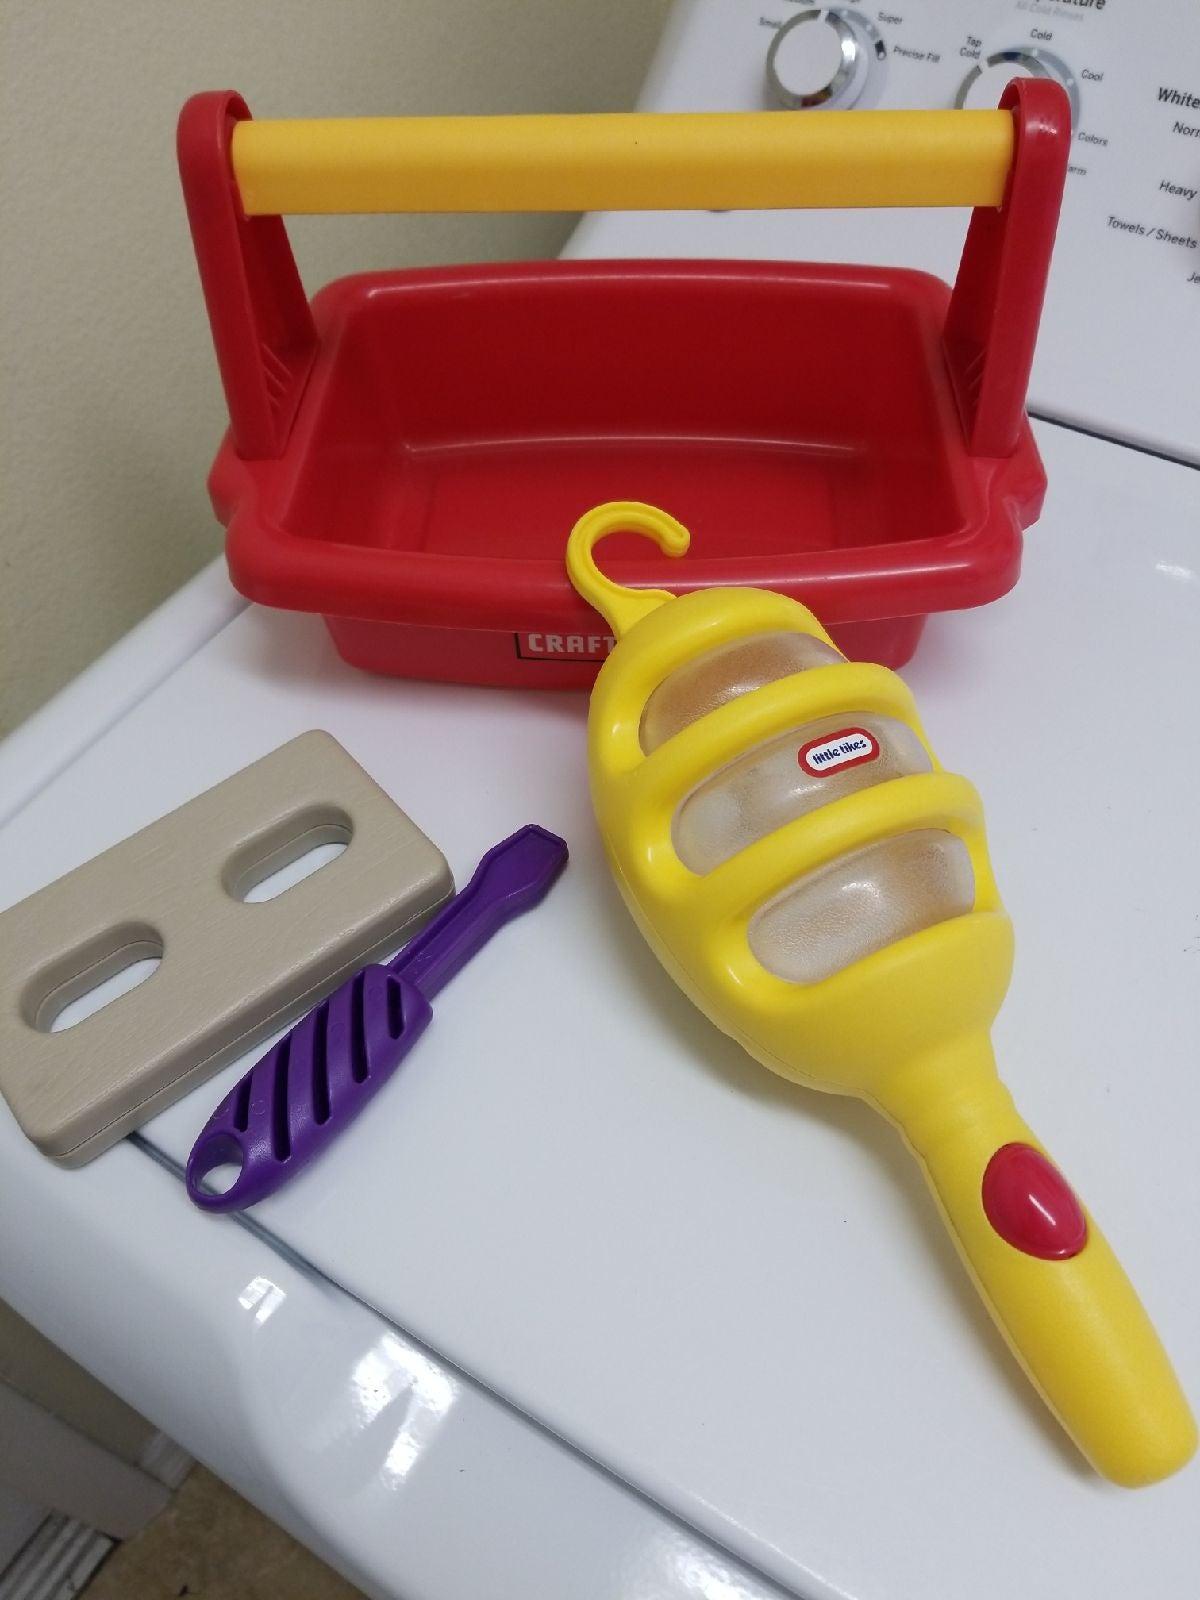 Little Tikes Craftsman Workbench Tools